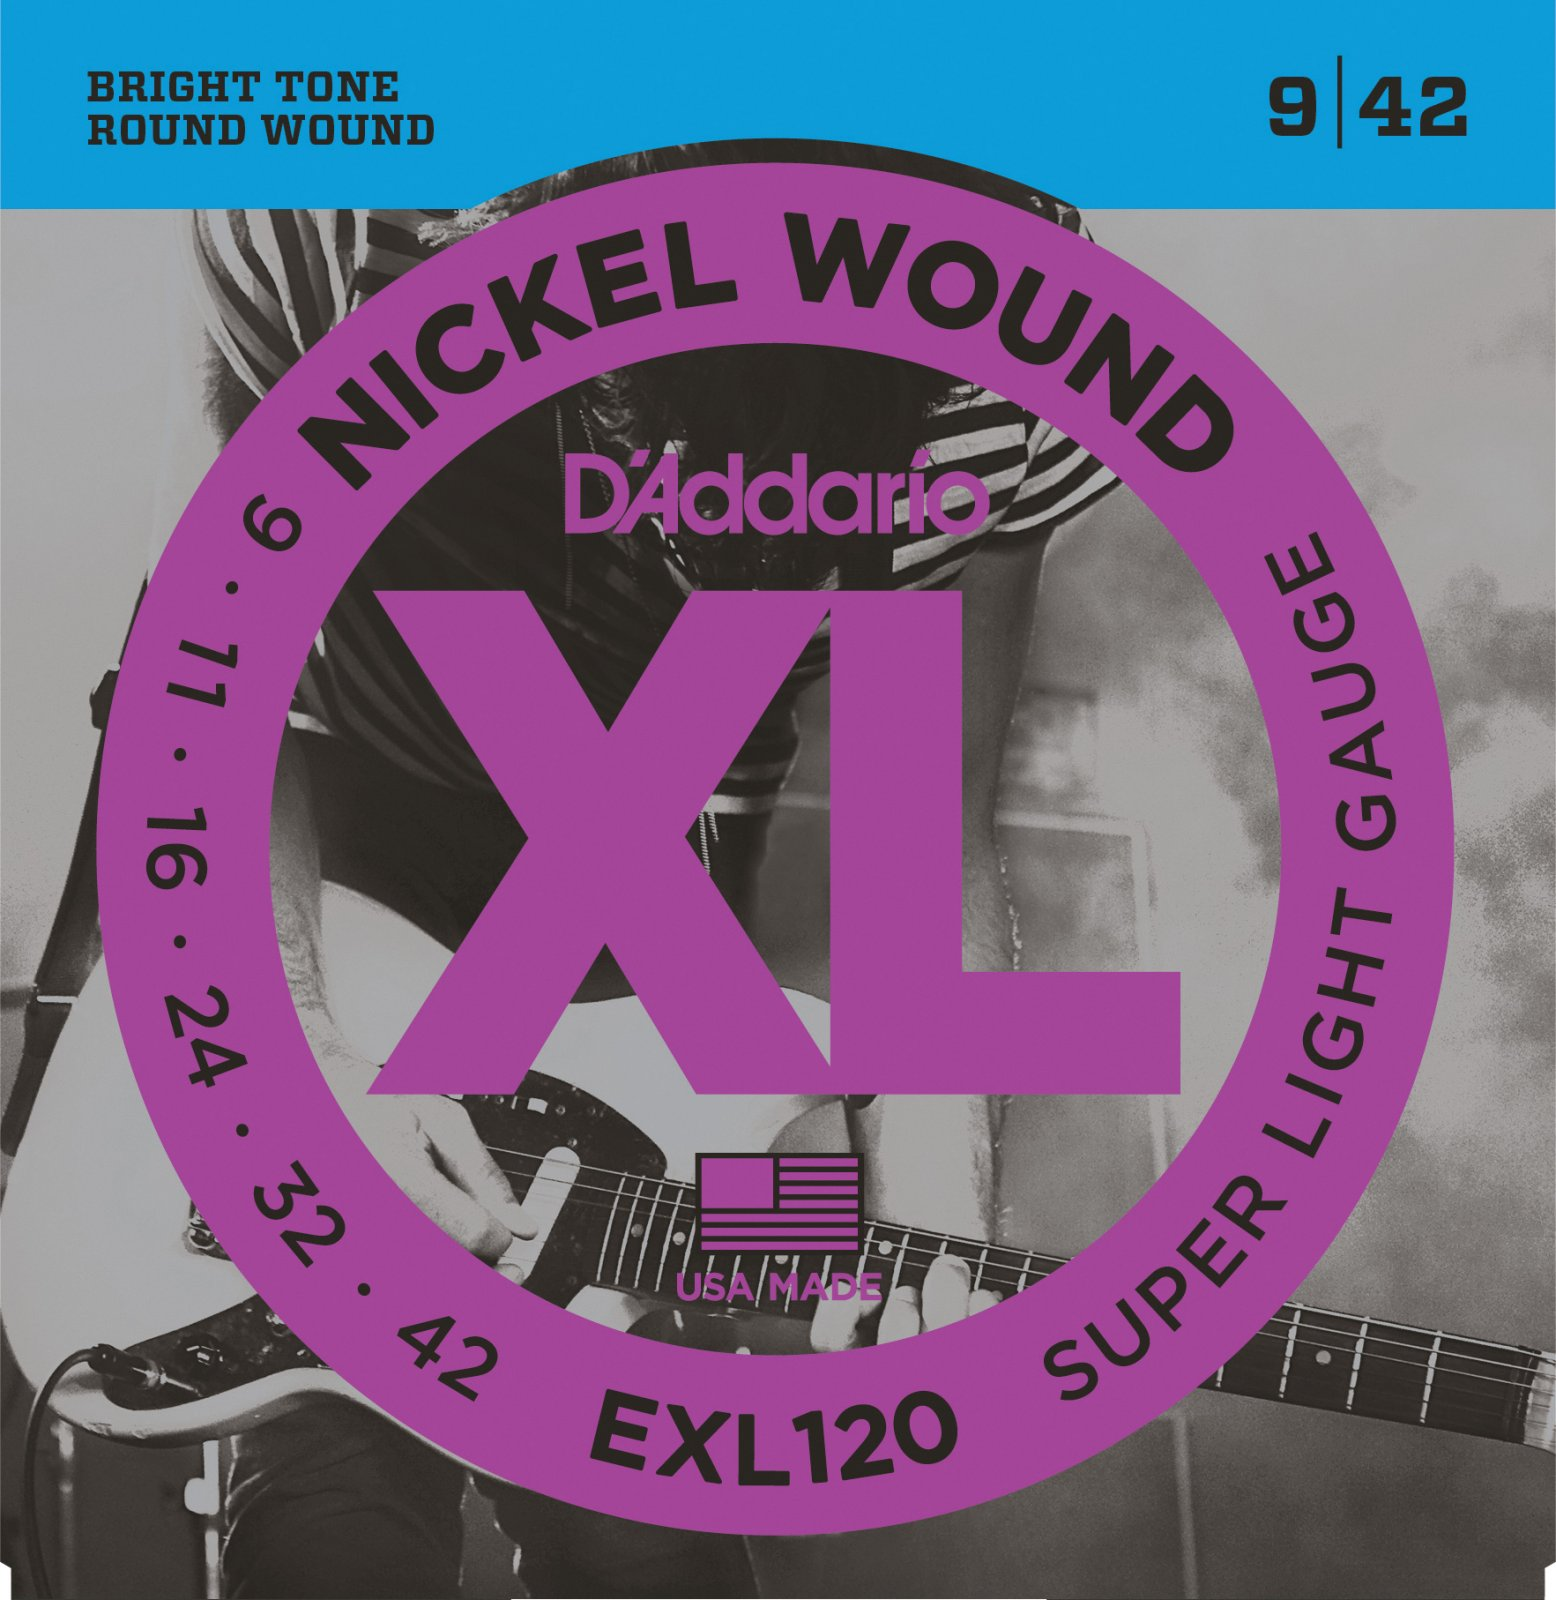 D'Addario EXL120 Nickel Wound Electric Guitar Strings - Super Light, 09-42